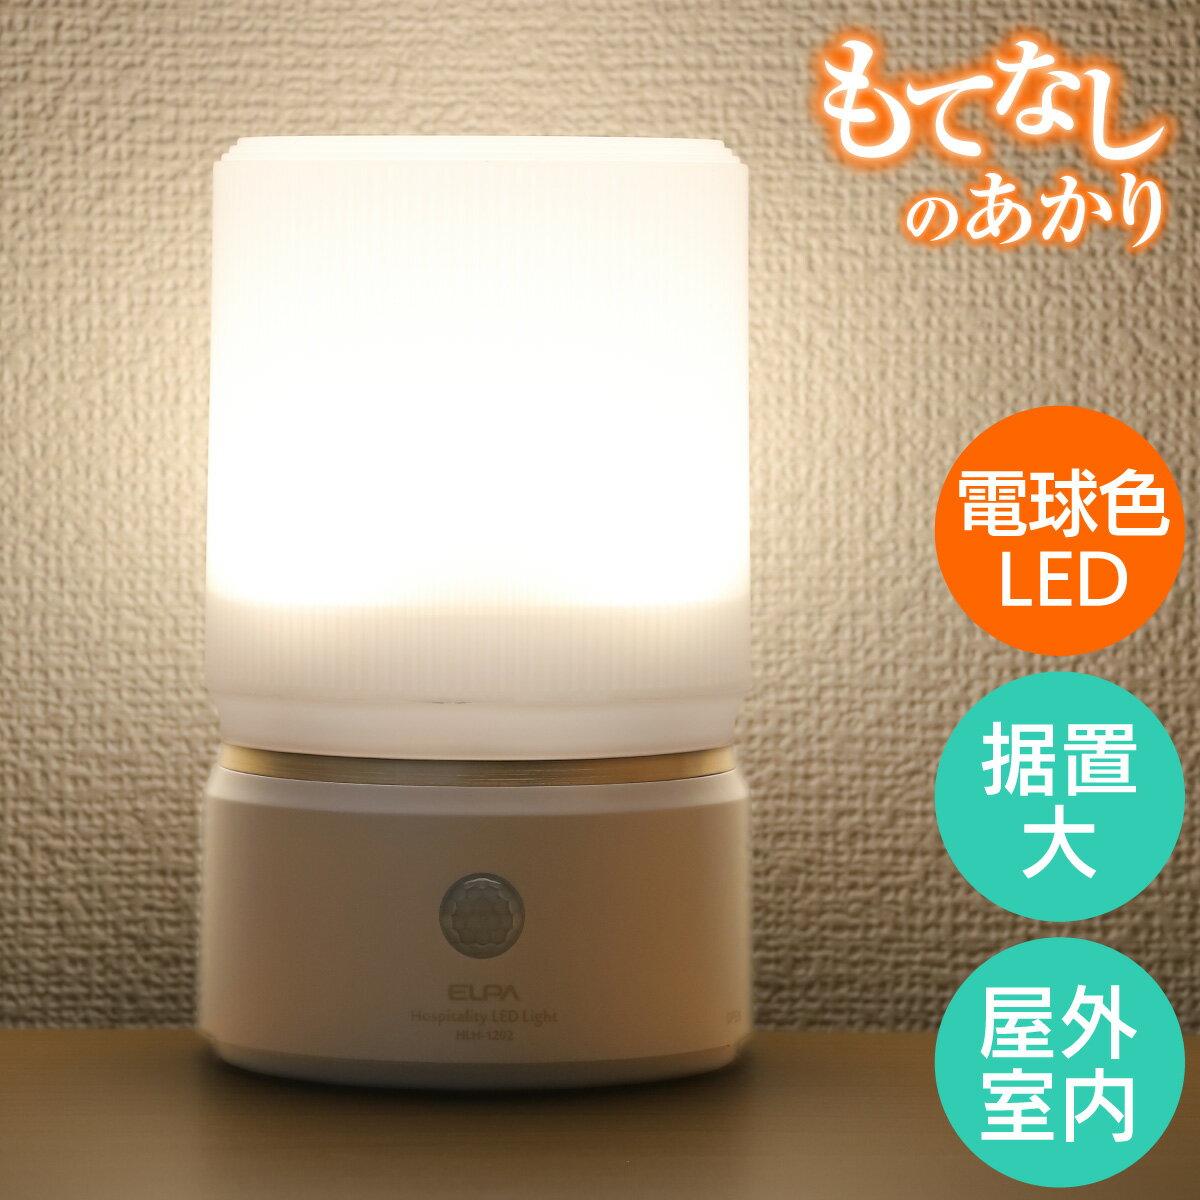 LED 人感センサーライト 屋外・屋内可 もてなしのあかり 置き型 フットライト 足元灯 HLH-1202 (PW)/ELPA